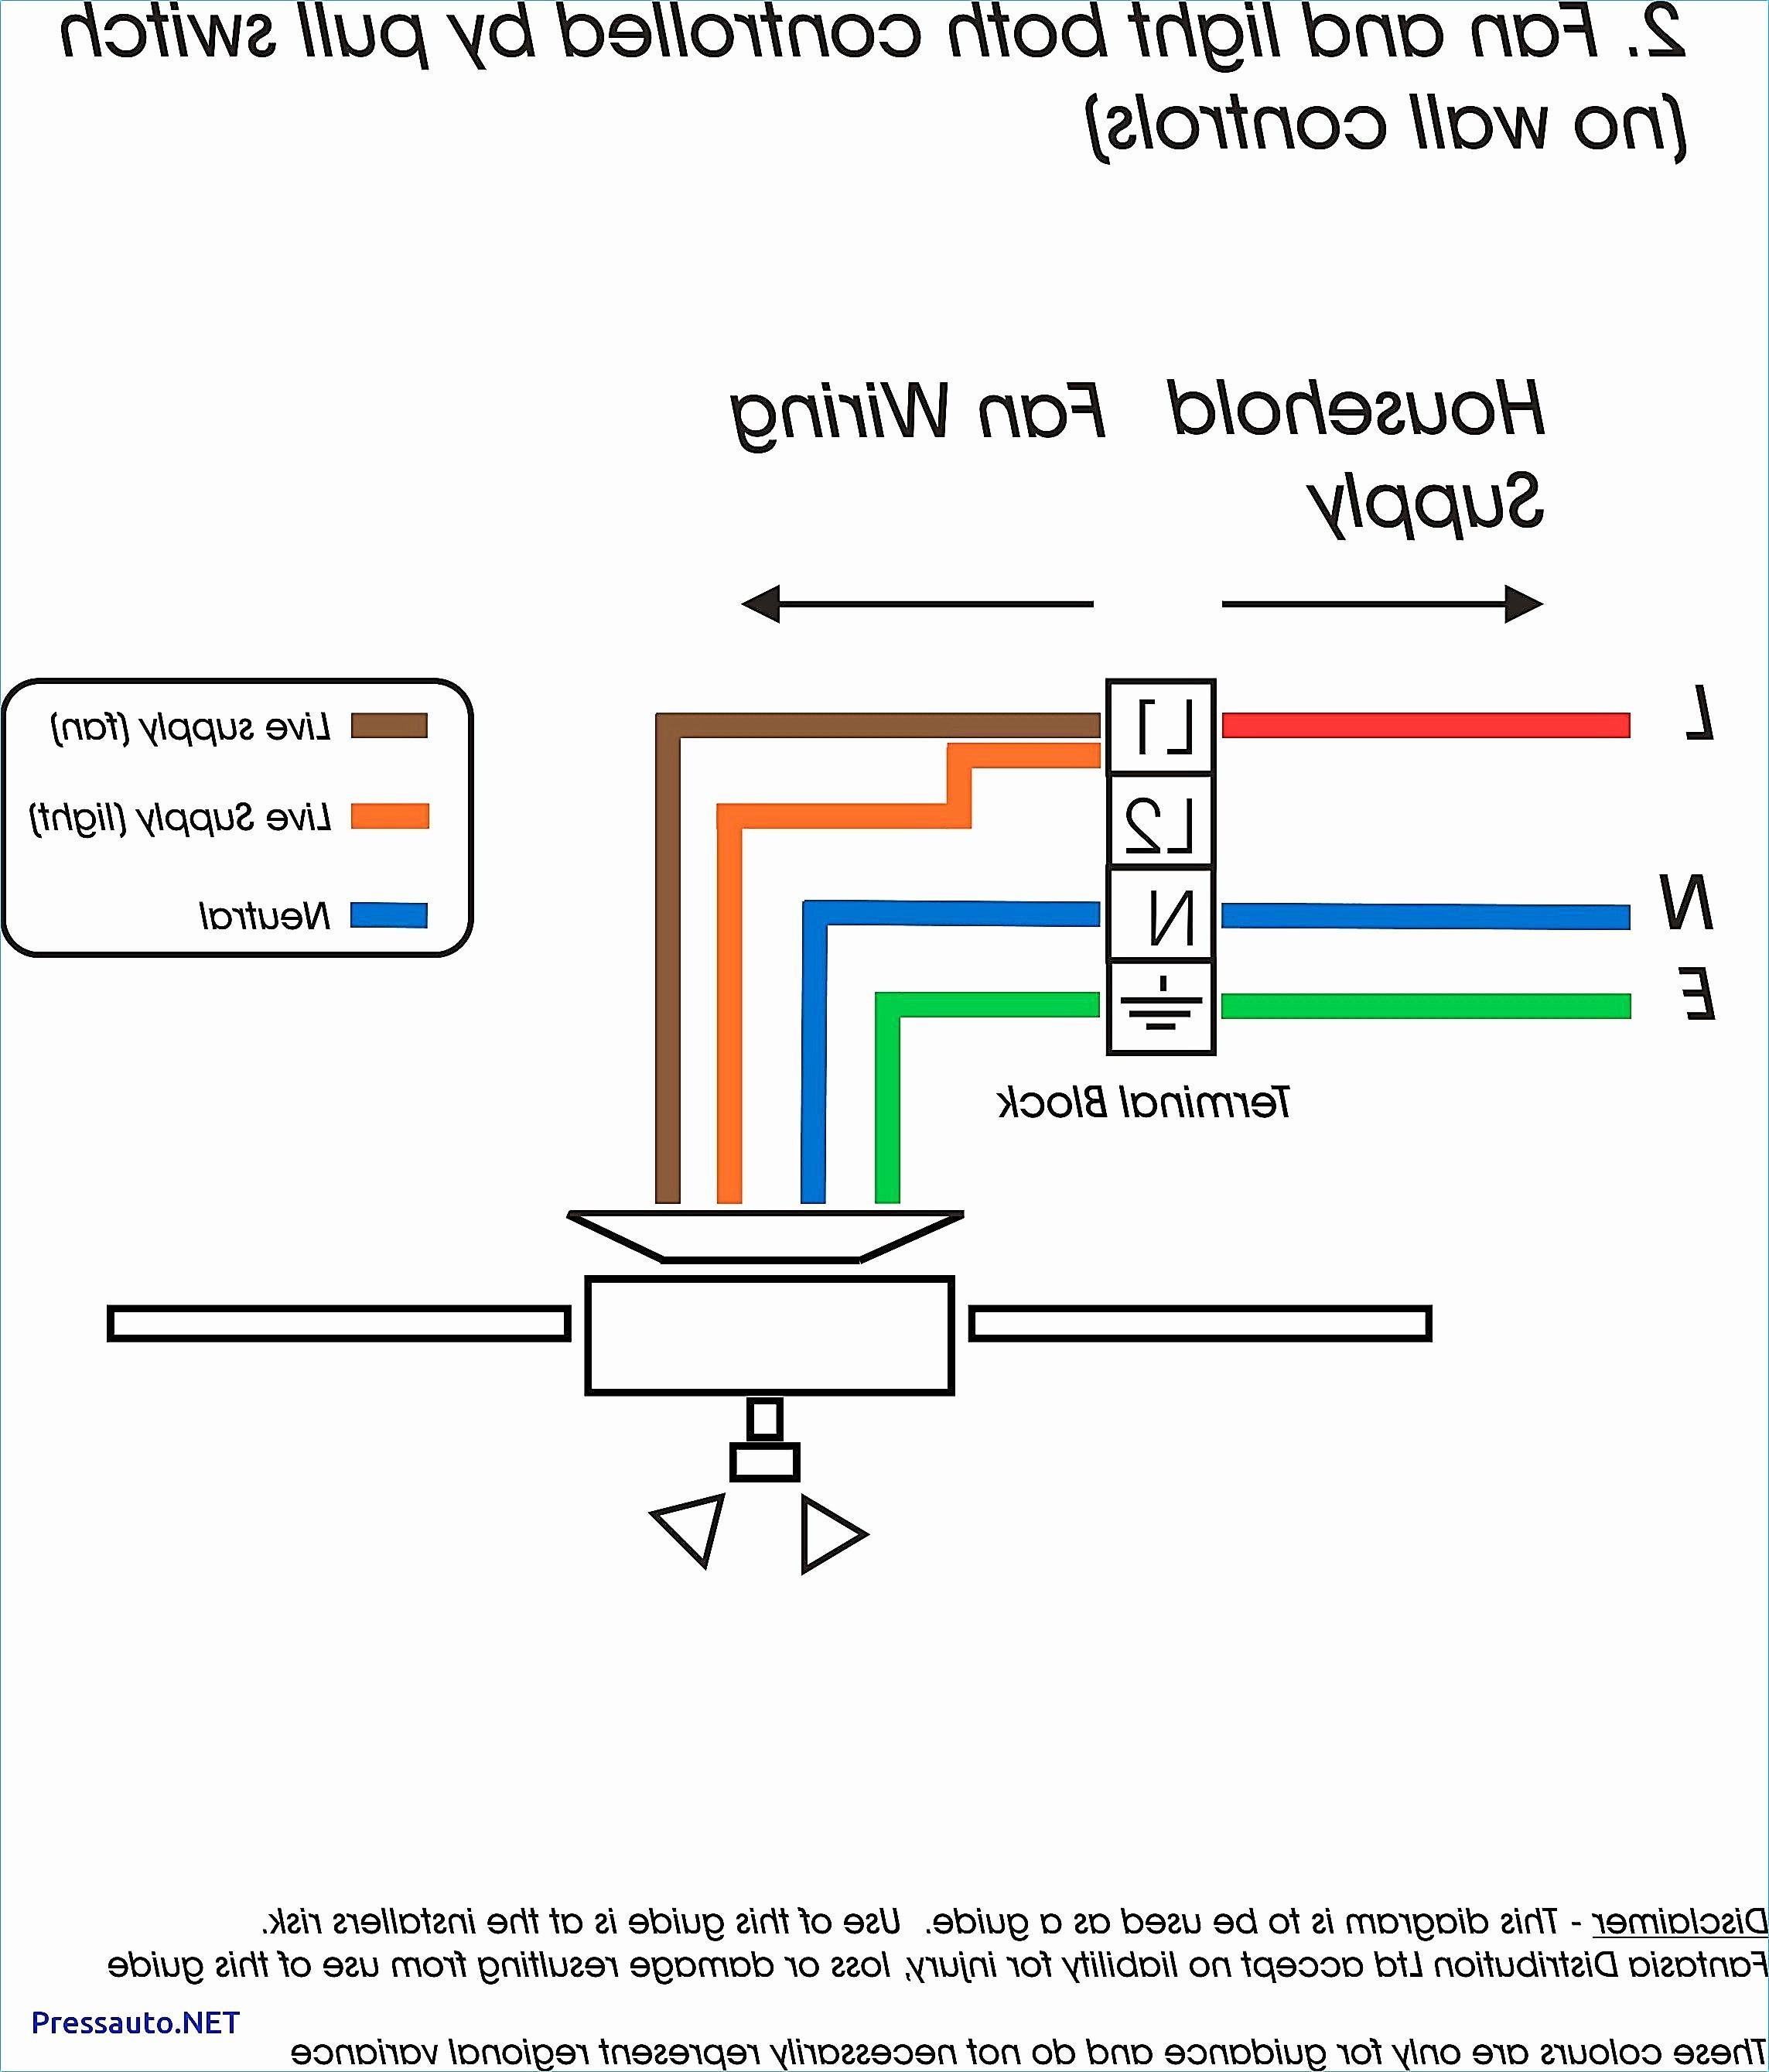 Vw Polo Engine Diagram Home Cctv Wiring Diagram Valid Wiring Diagram Vw Polo 6n Archives Of Vw Polo Engine Diagram